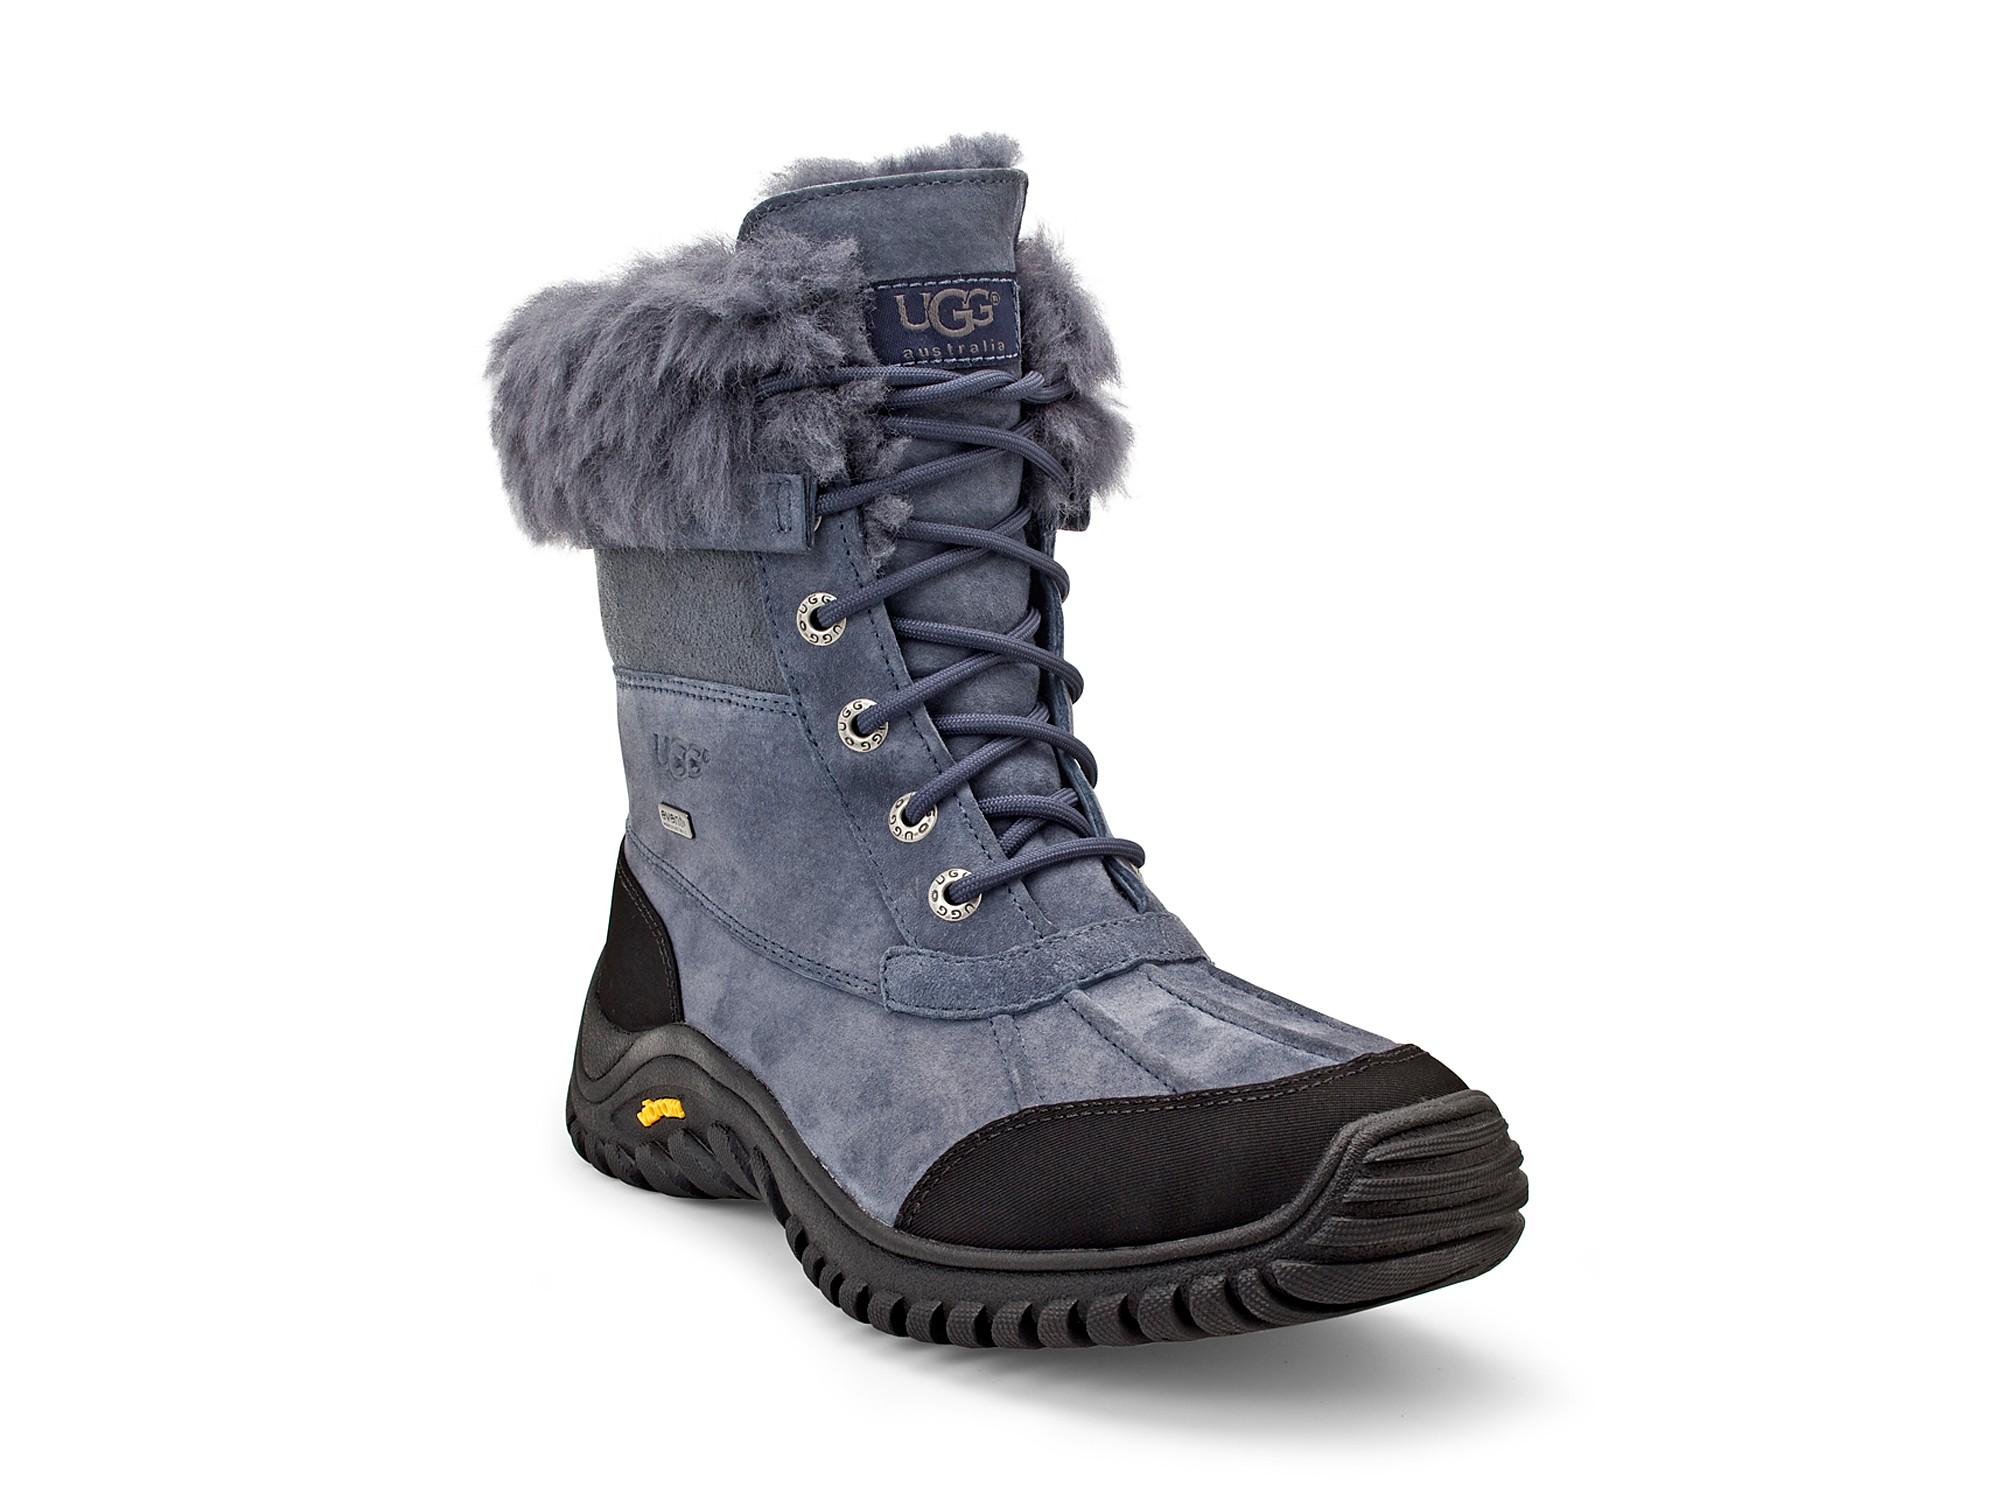 Lyst Ugg Adirondak Snow Boots In White